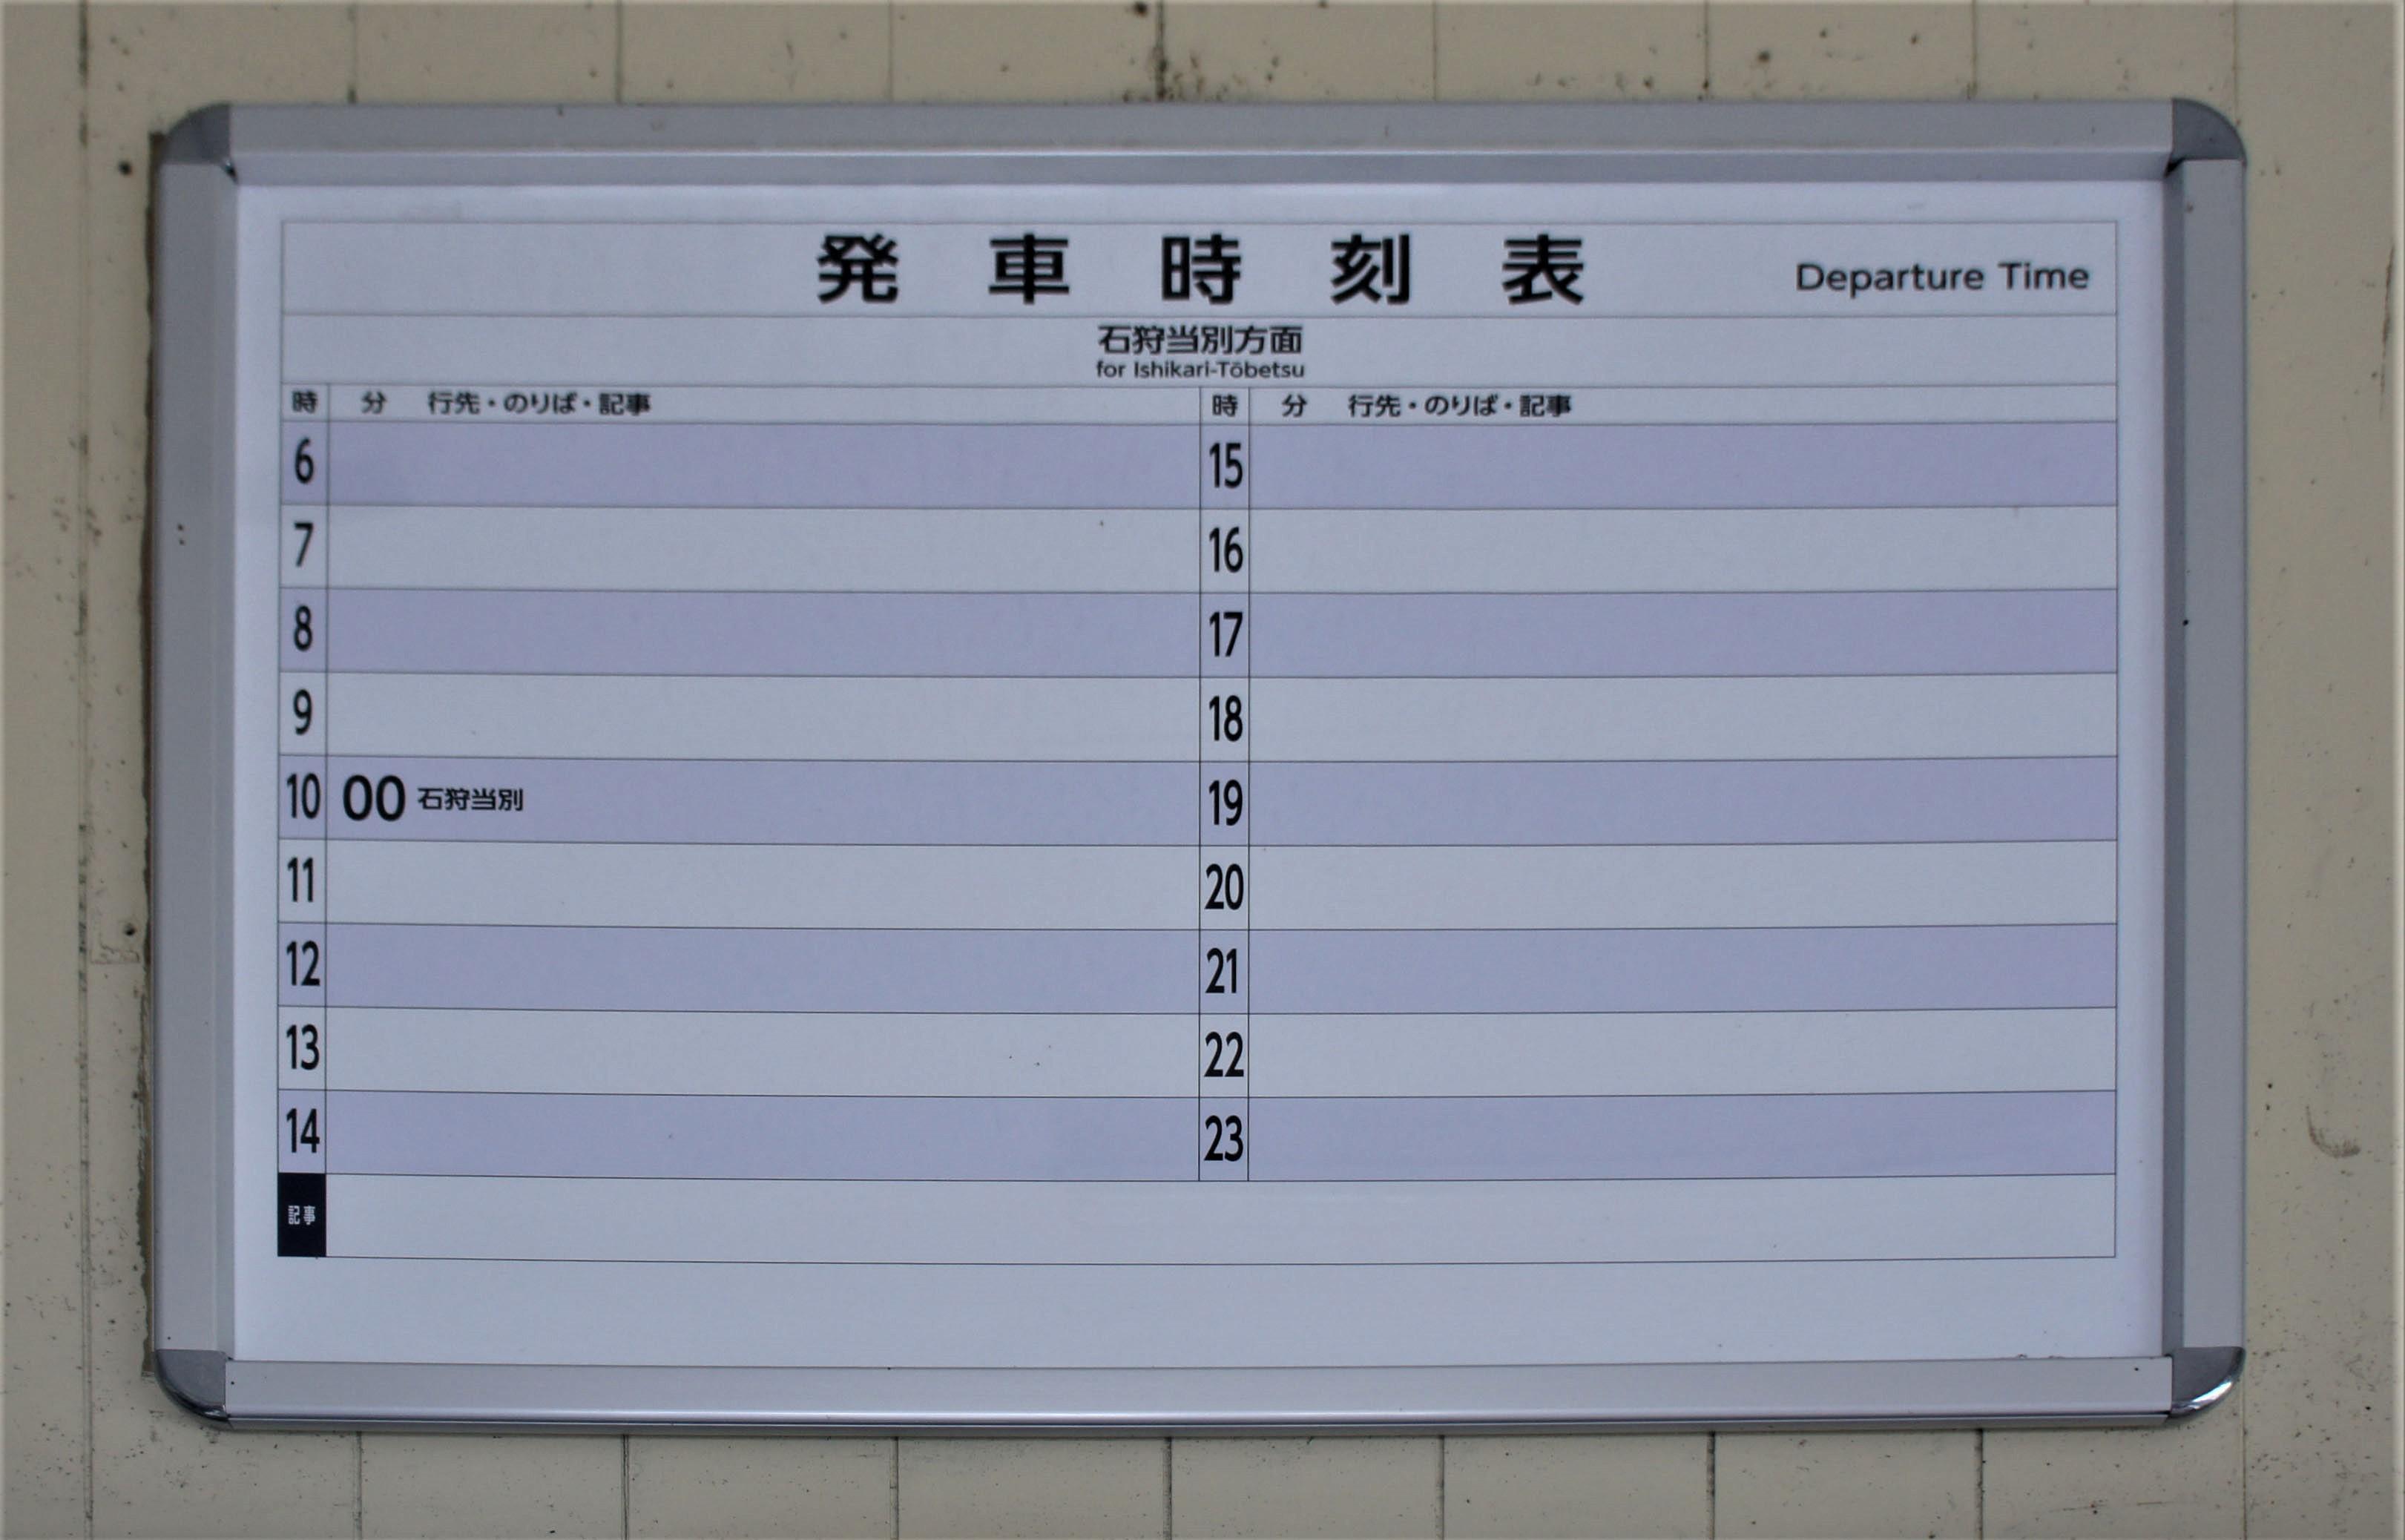 JR Sassho-Line Shin-Totsukawa Station Timetable (2018-05-20).jpg